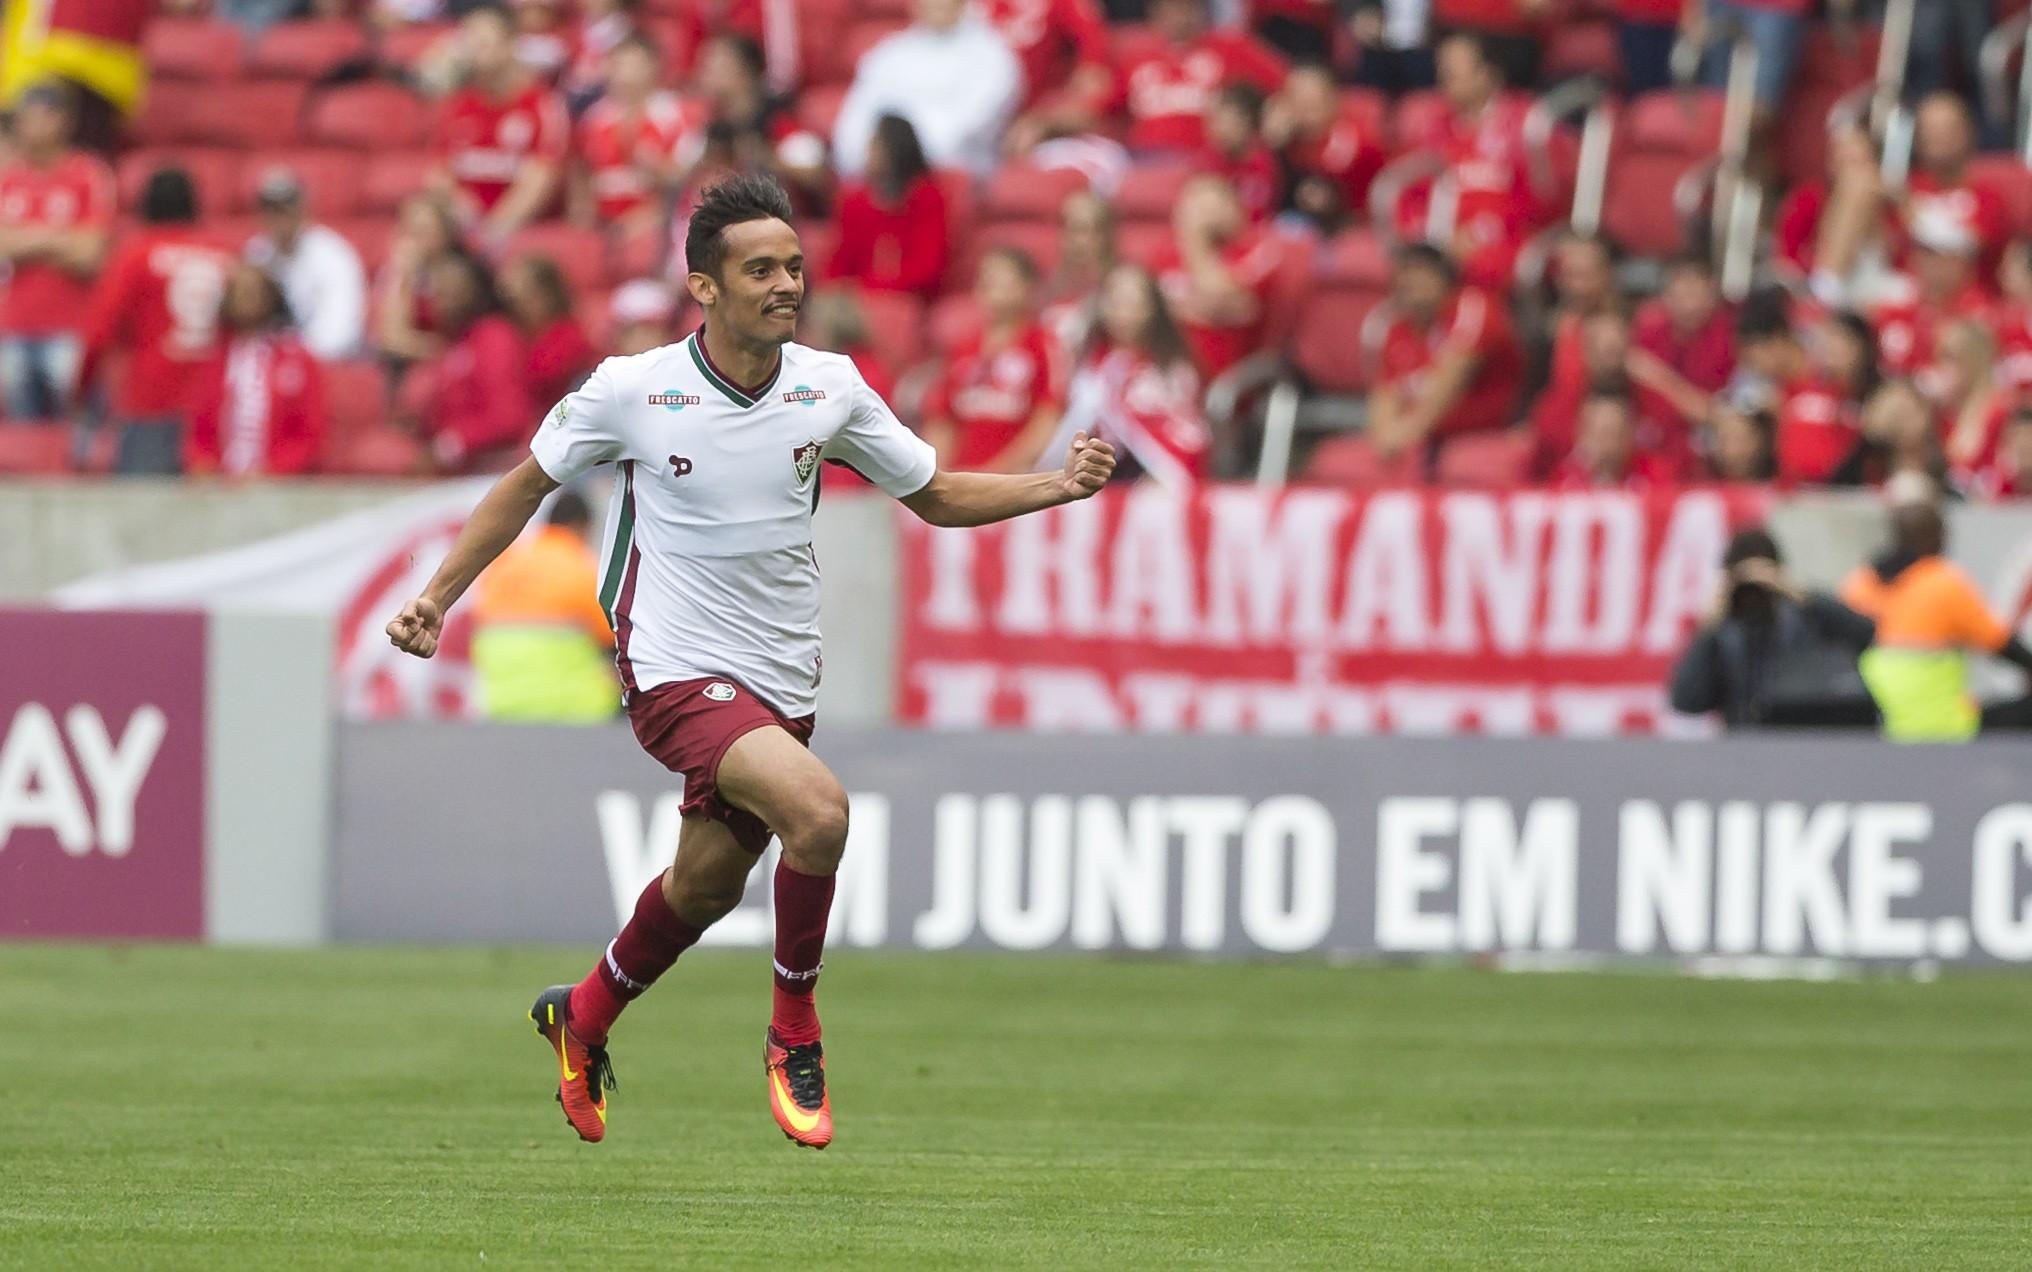 fdbc592866 http   globoesporte.globo.com mt futebol noticia 2016 08 torcida-lota ...